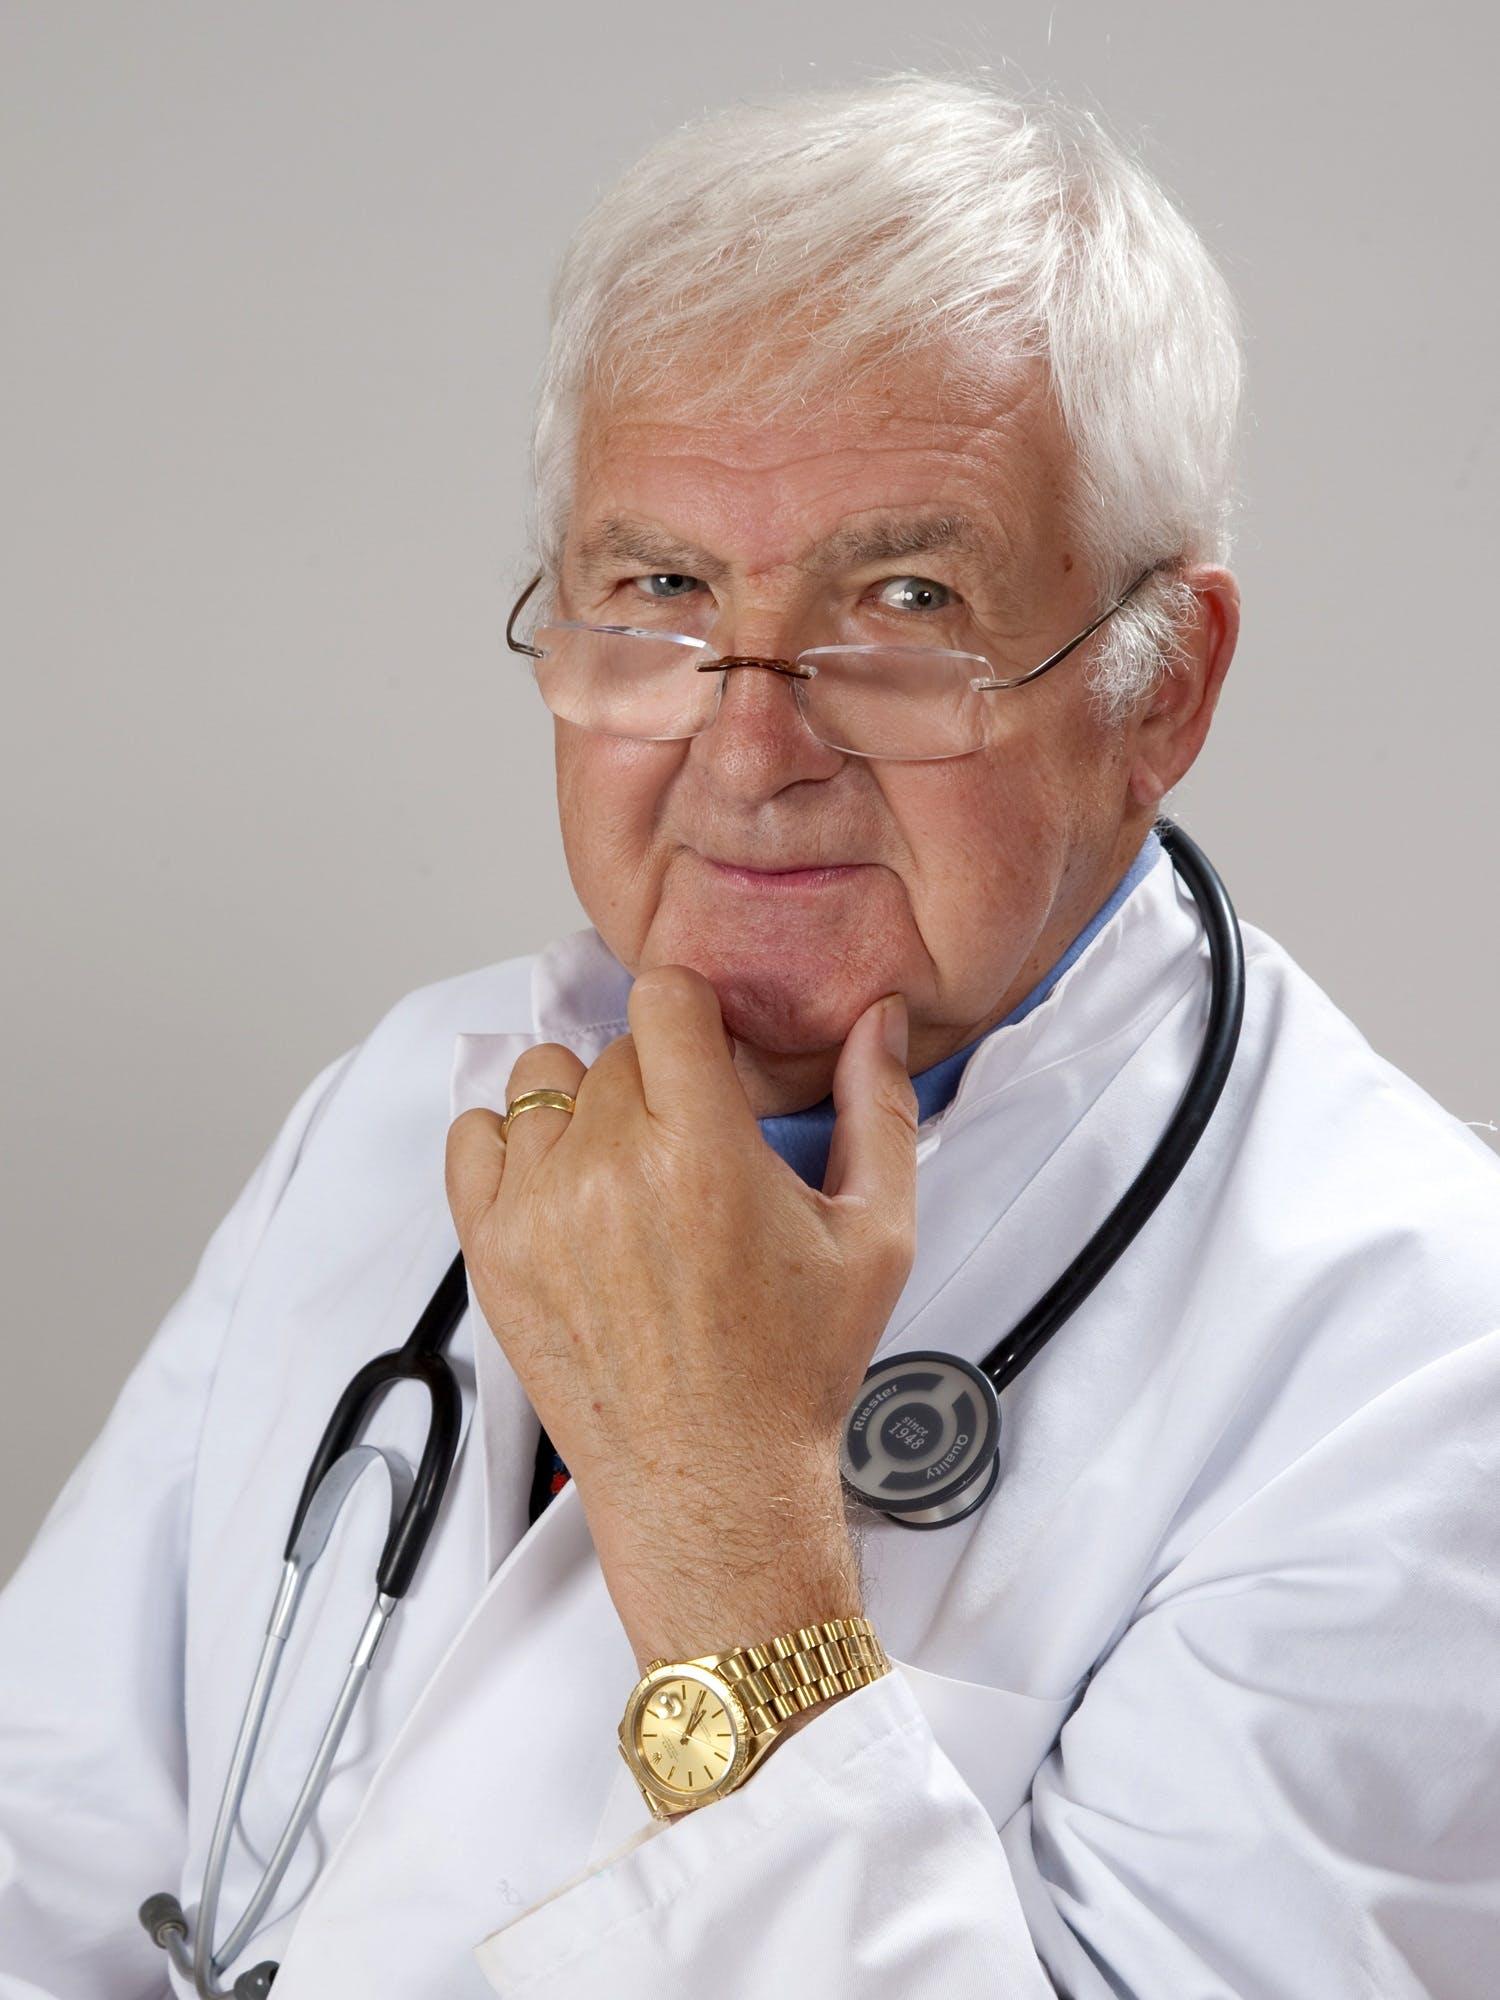 Médecin portant un stéthoscope | Photo : Pexels